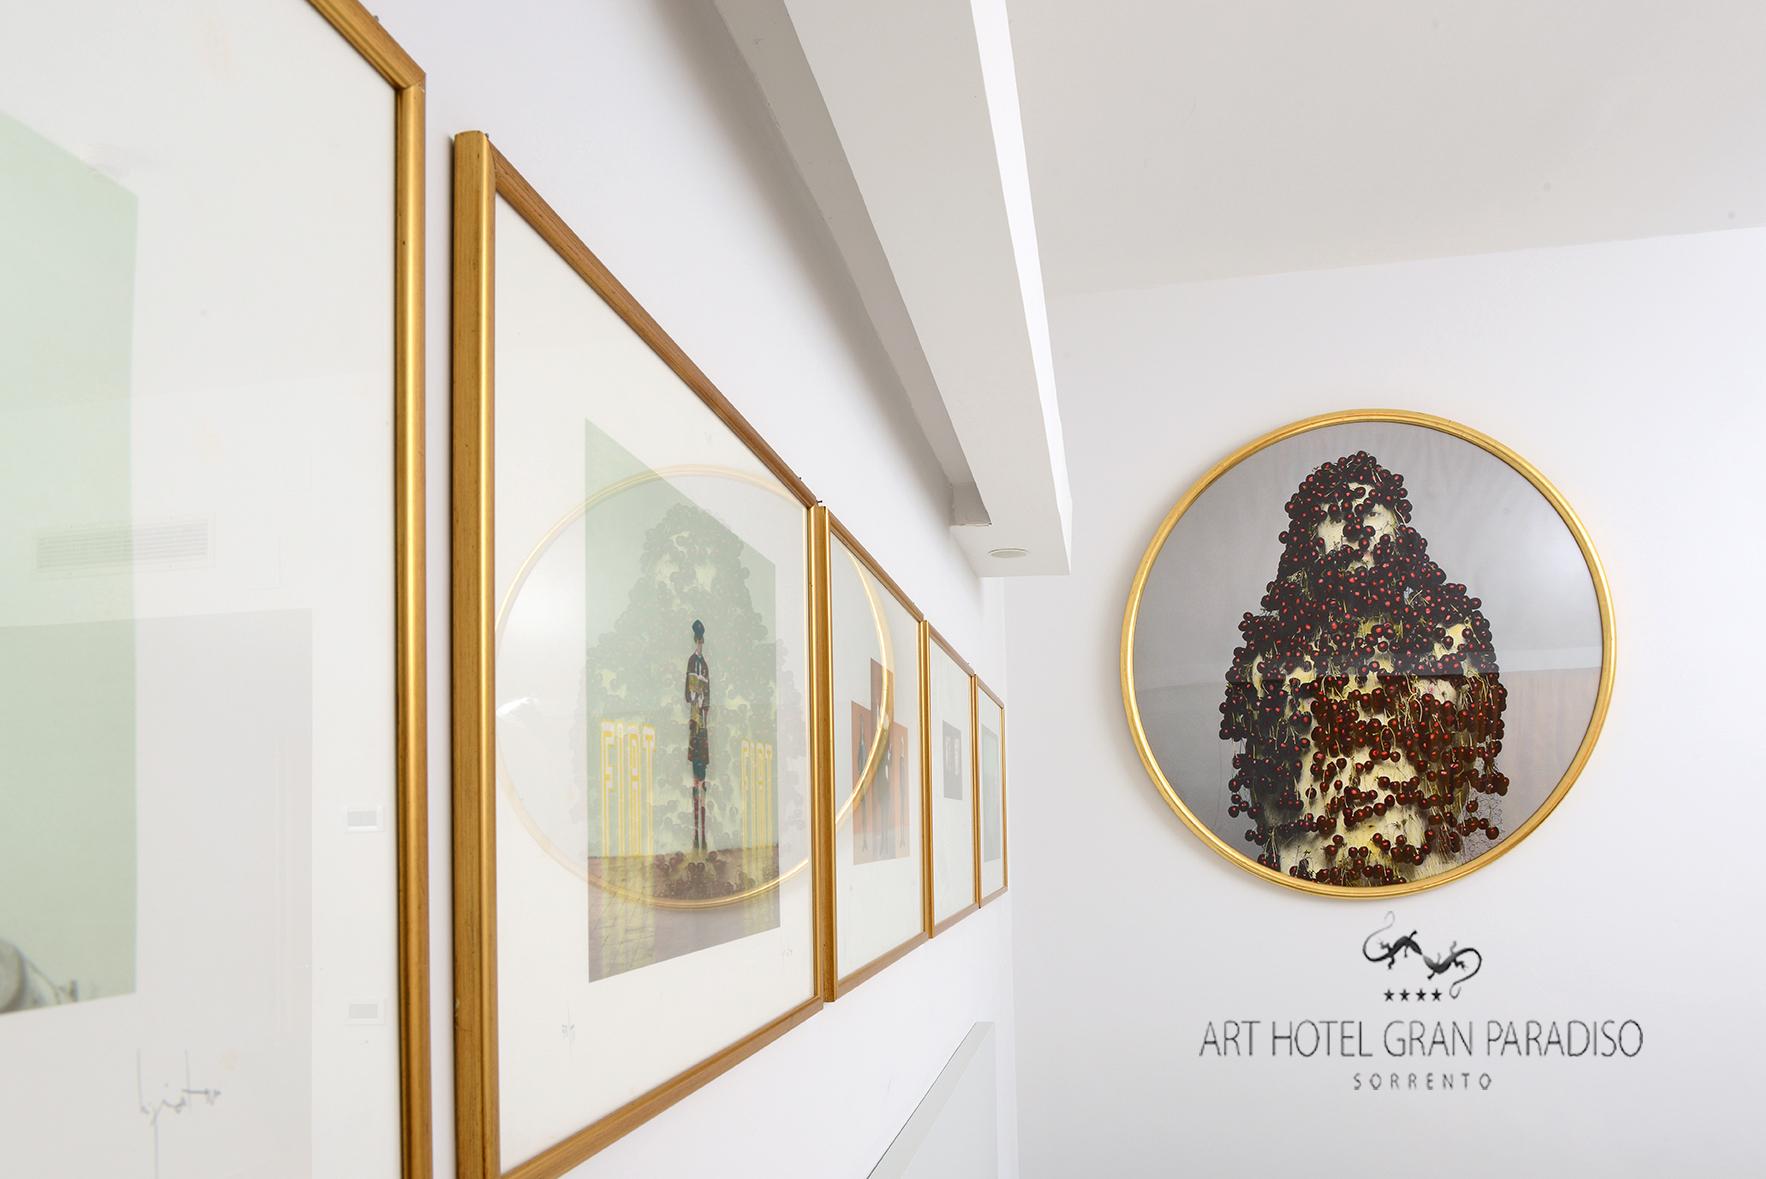 Art_Hotel_Gran_Paradiso_2013_411_Luigi_Ontani_3.jpg